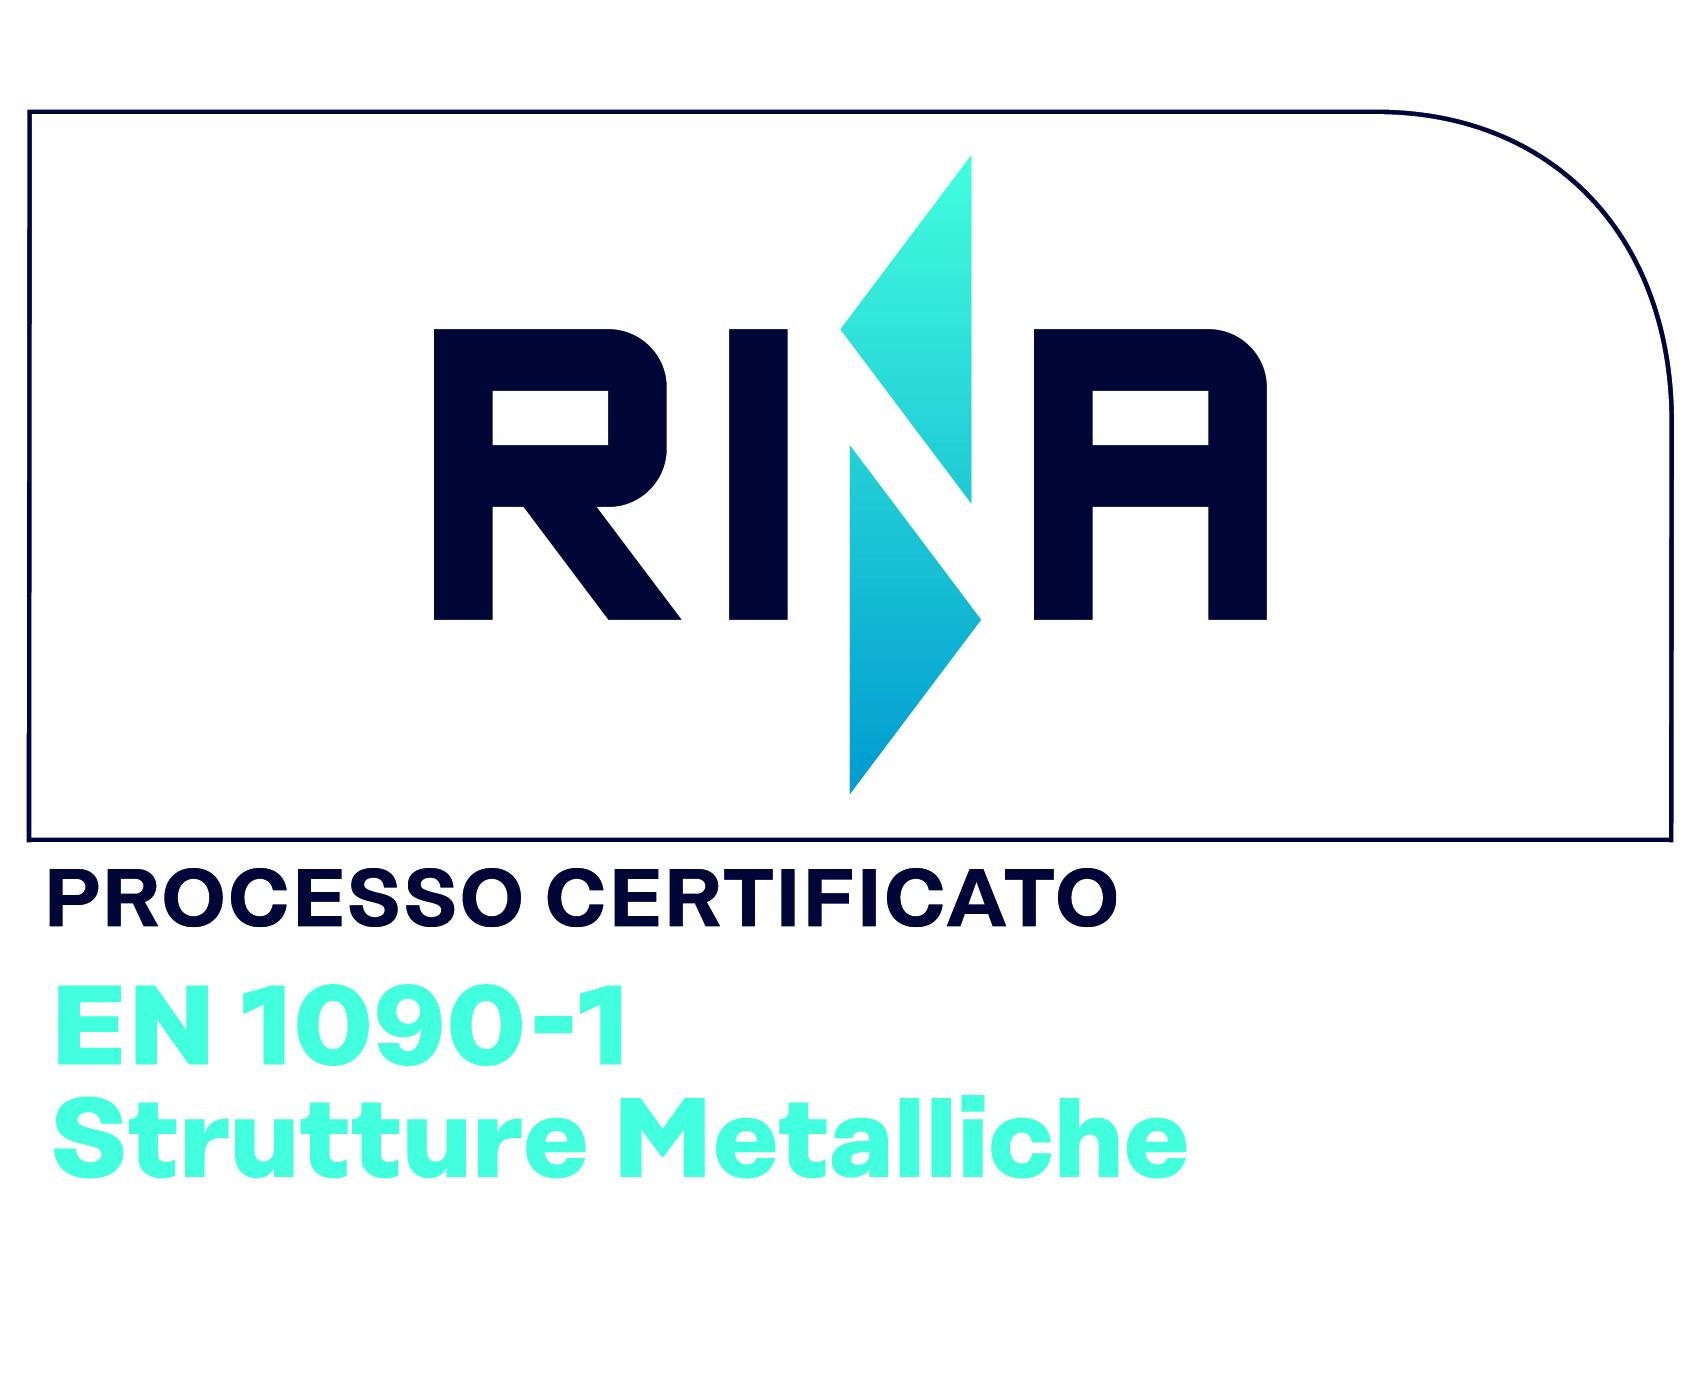 Certificazione EN 1090-1